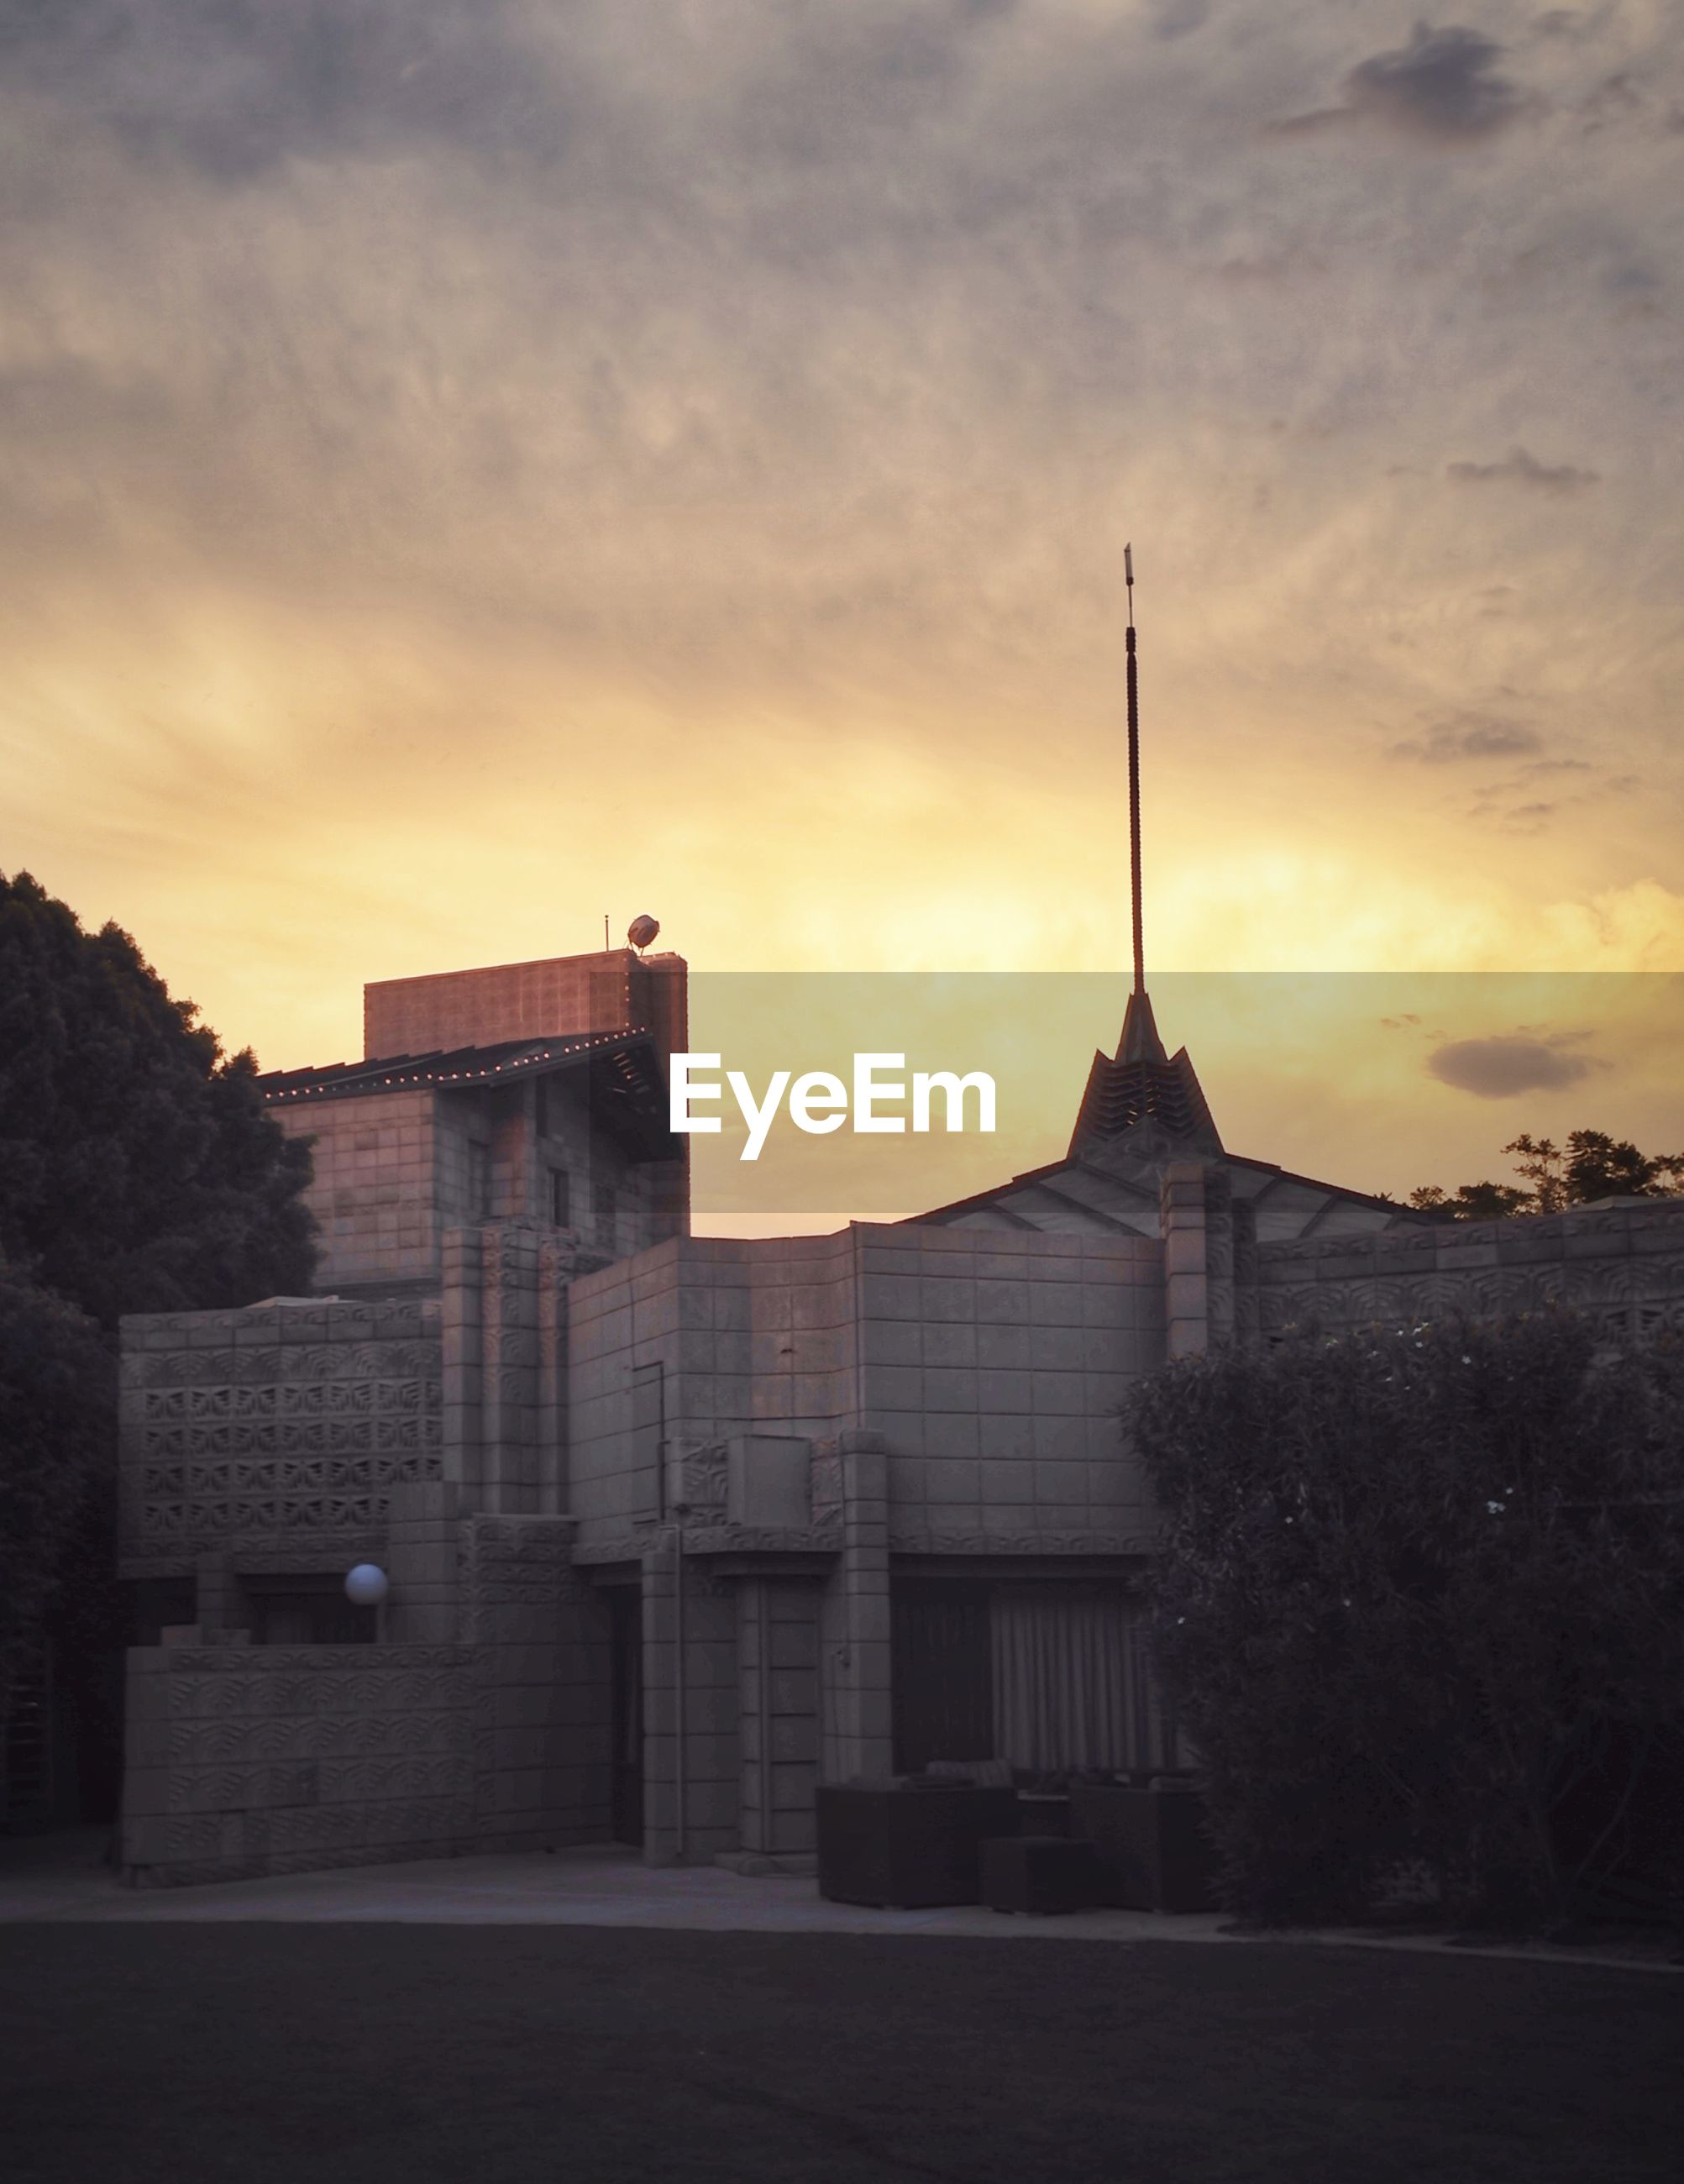 Arizona biltmore hotel against sunset sky